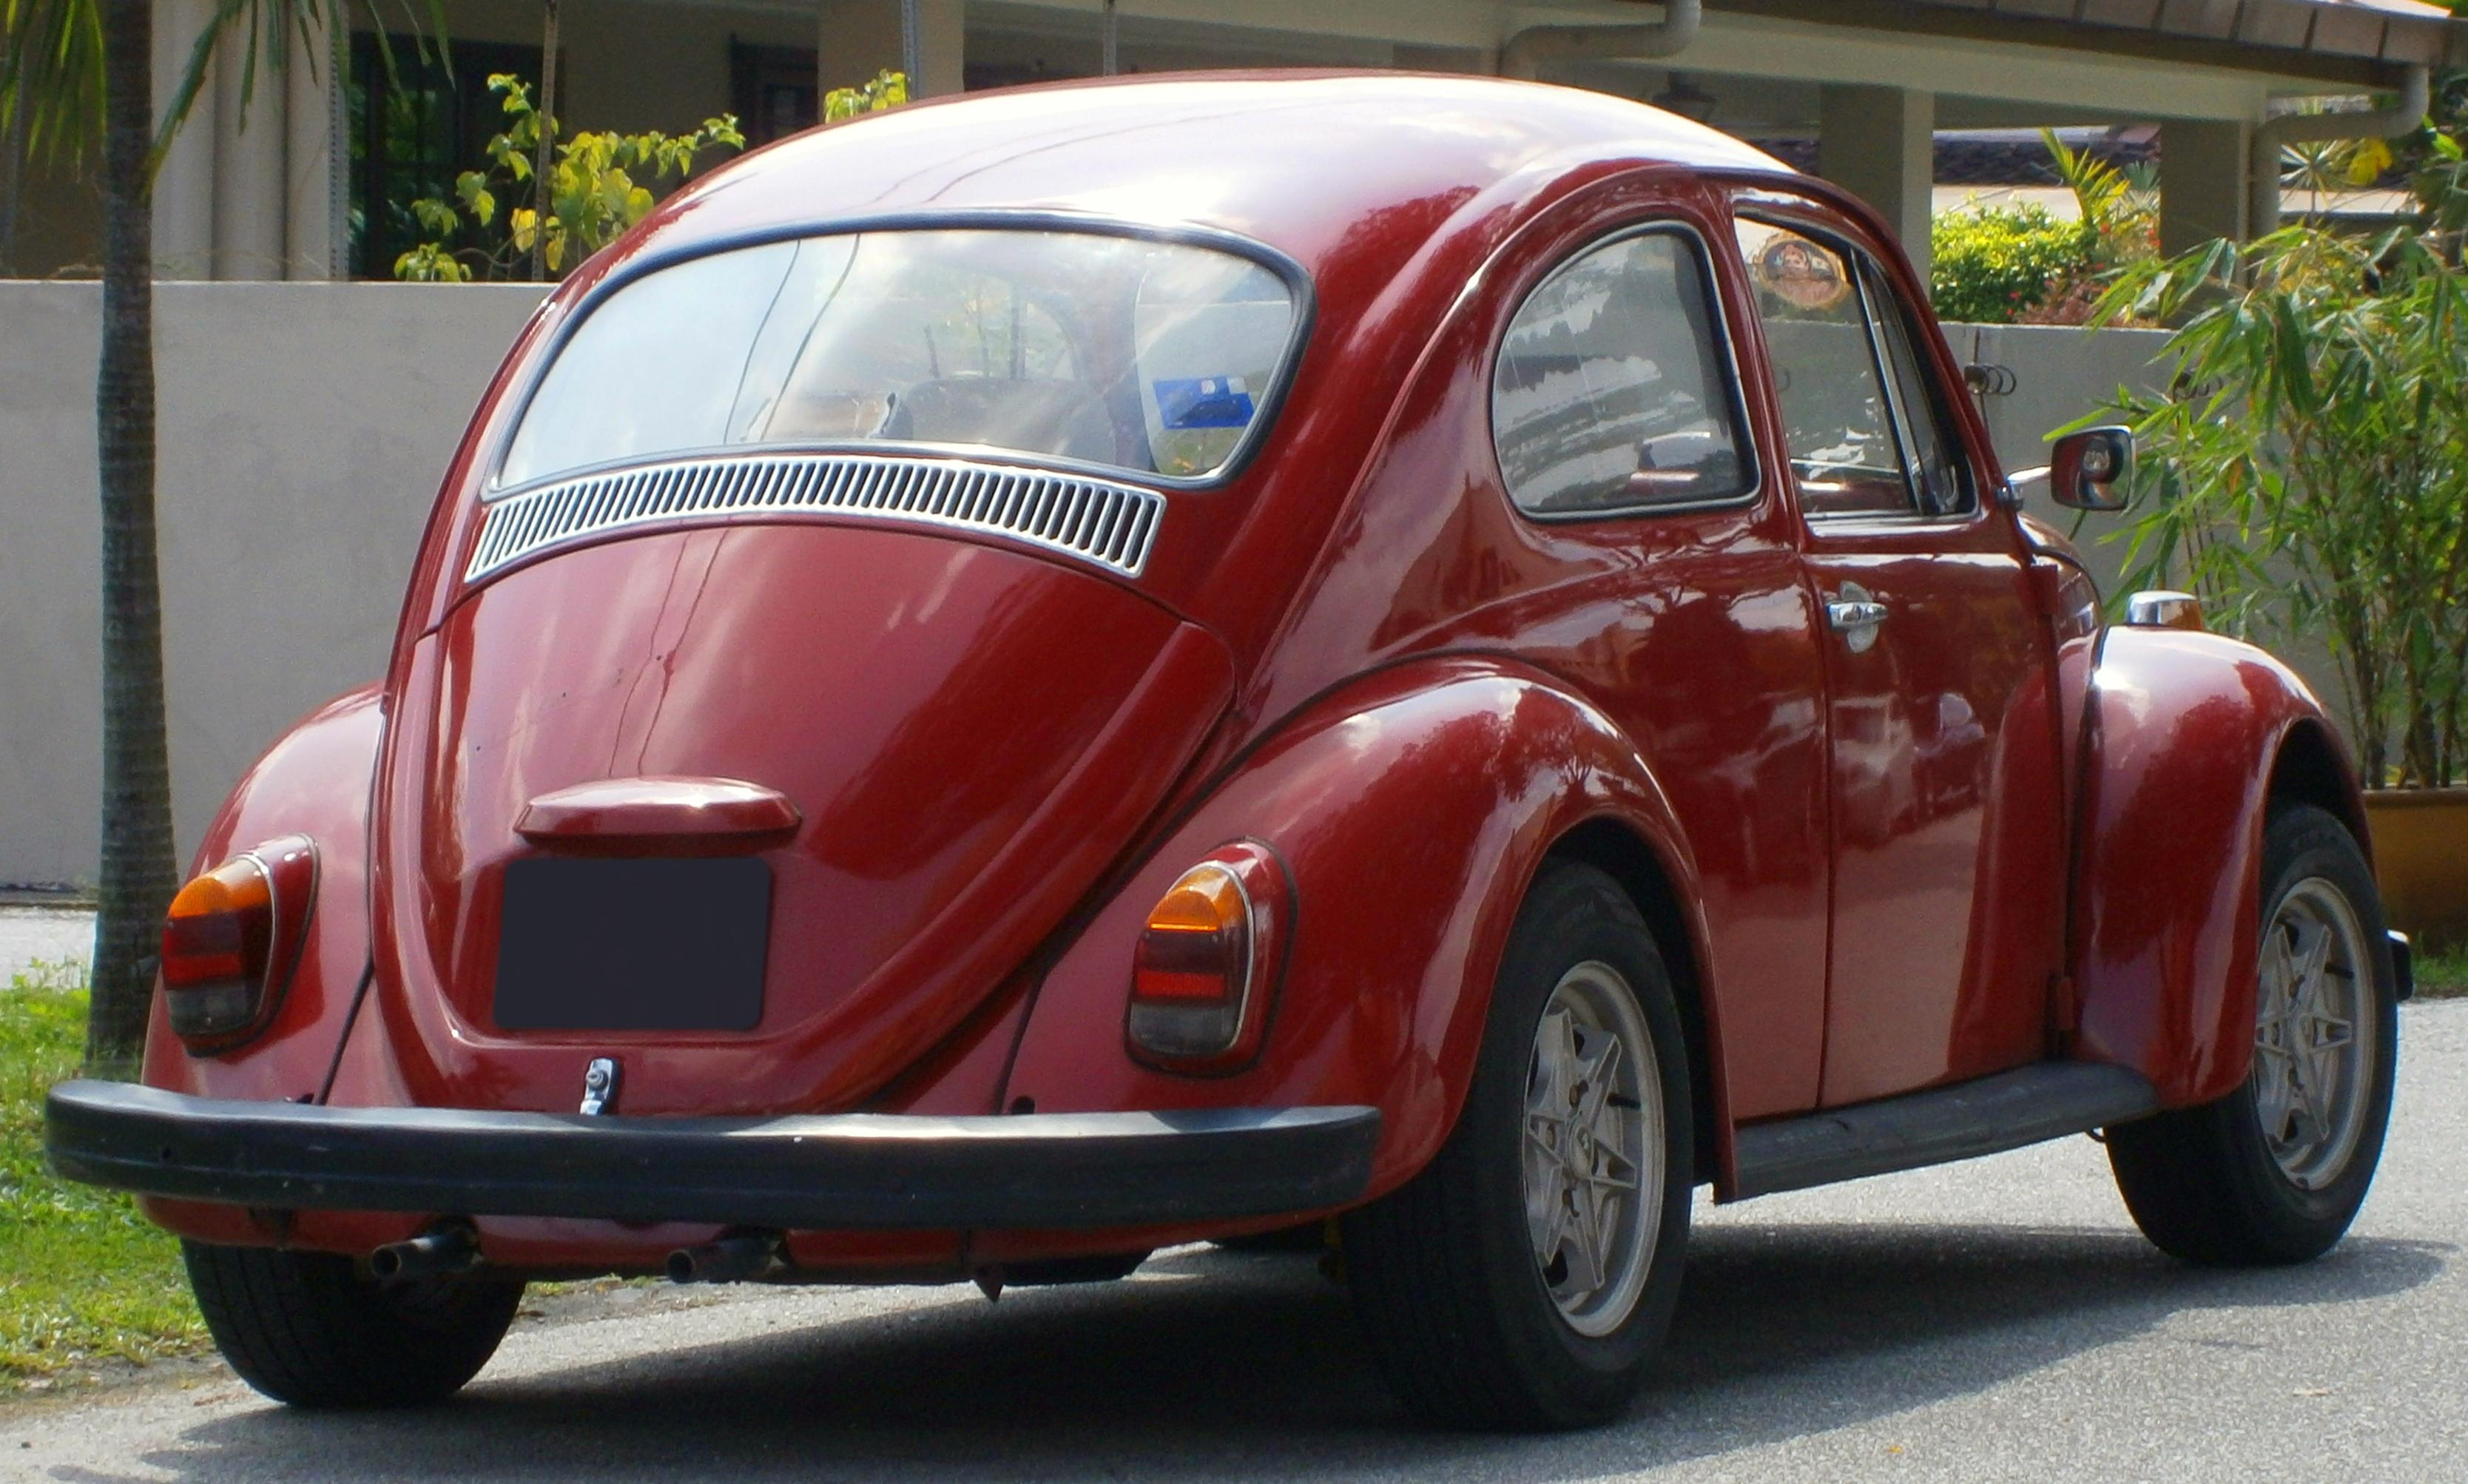 File:1969 Volkswagen Beetle in Subang Jaya, Malaysia (02).jpg - Wikimedia Commons